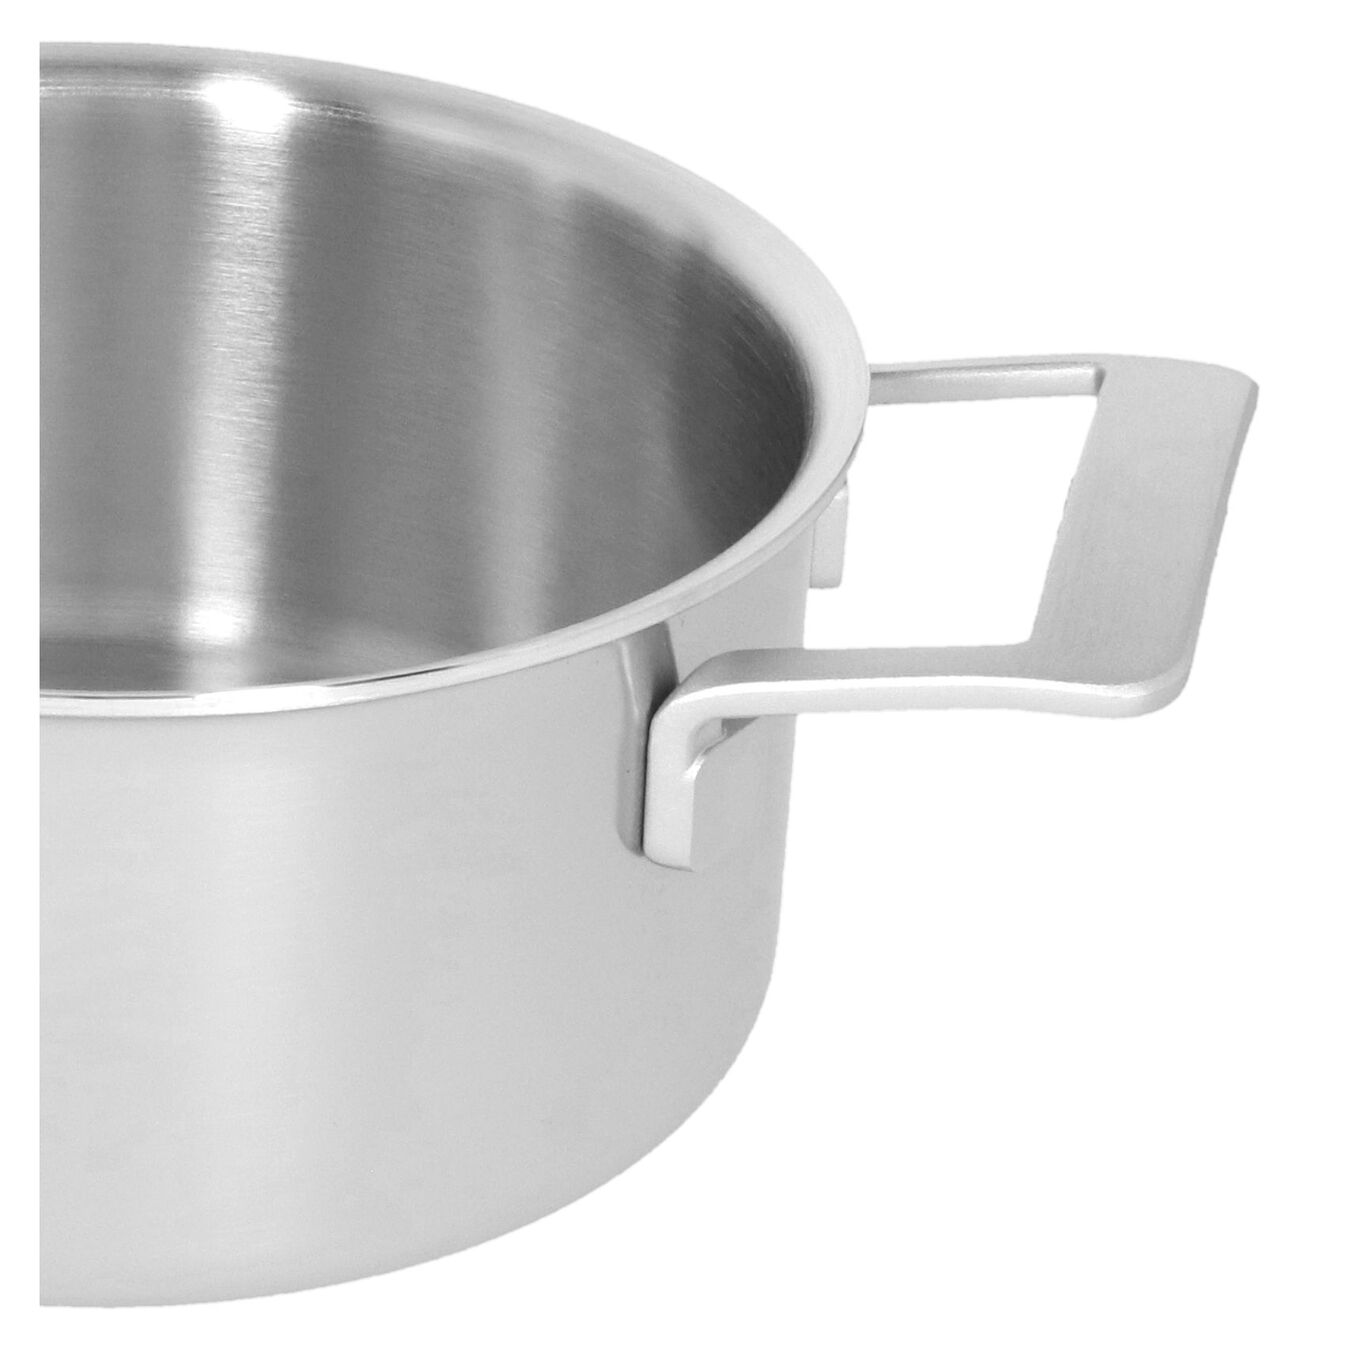 Kookpot met deksel 20 cm / 3 l,,large 4